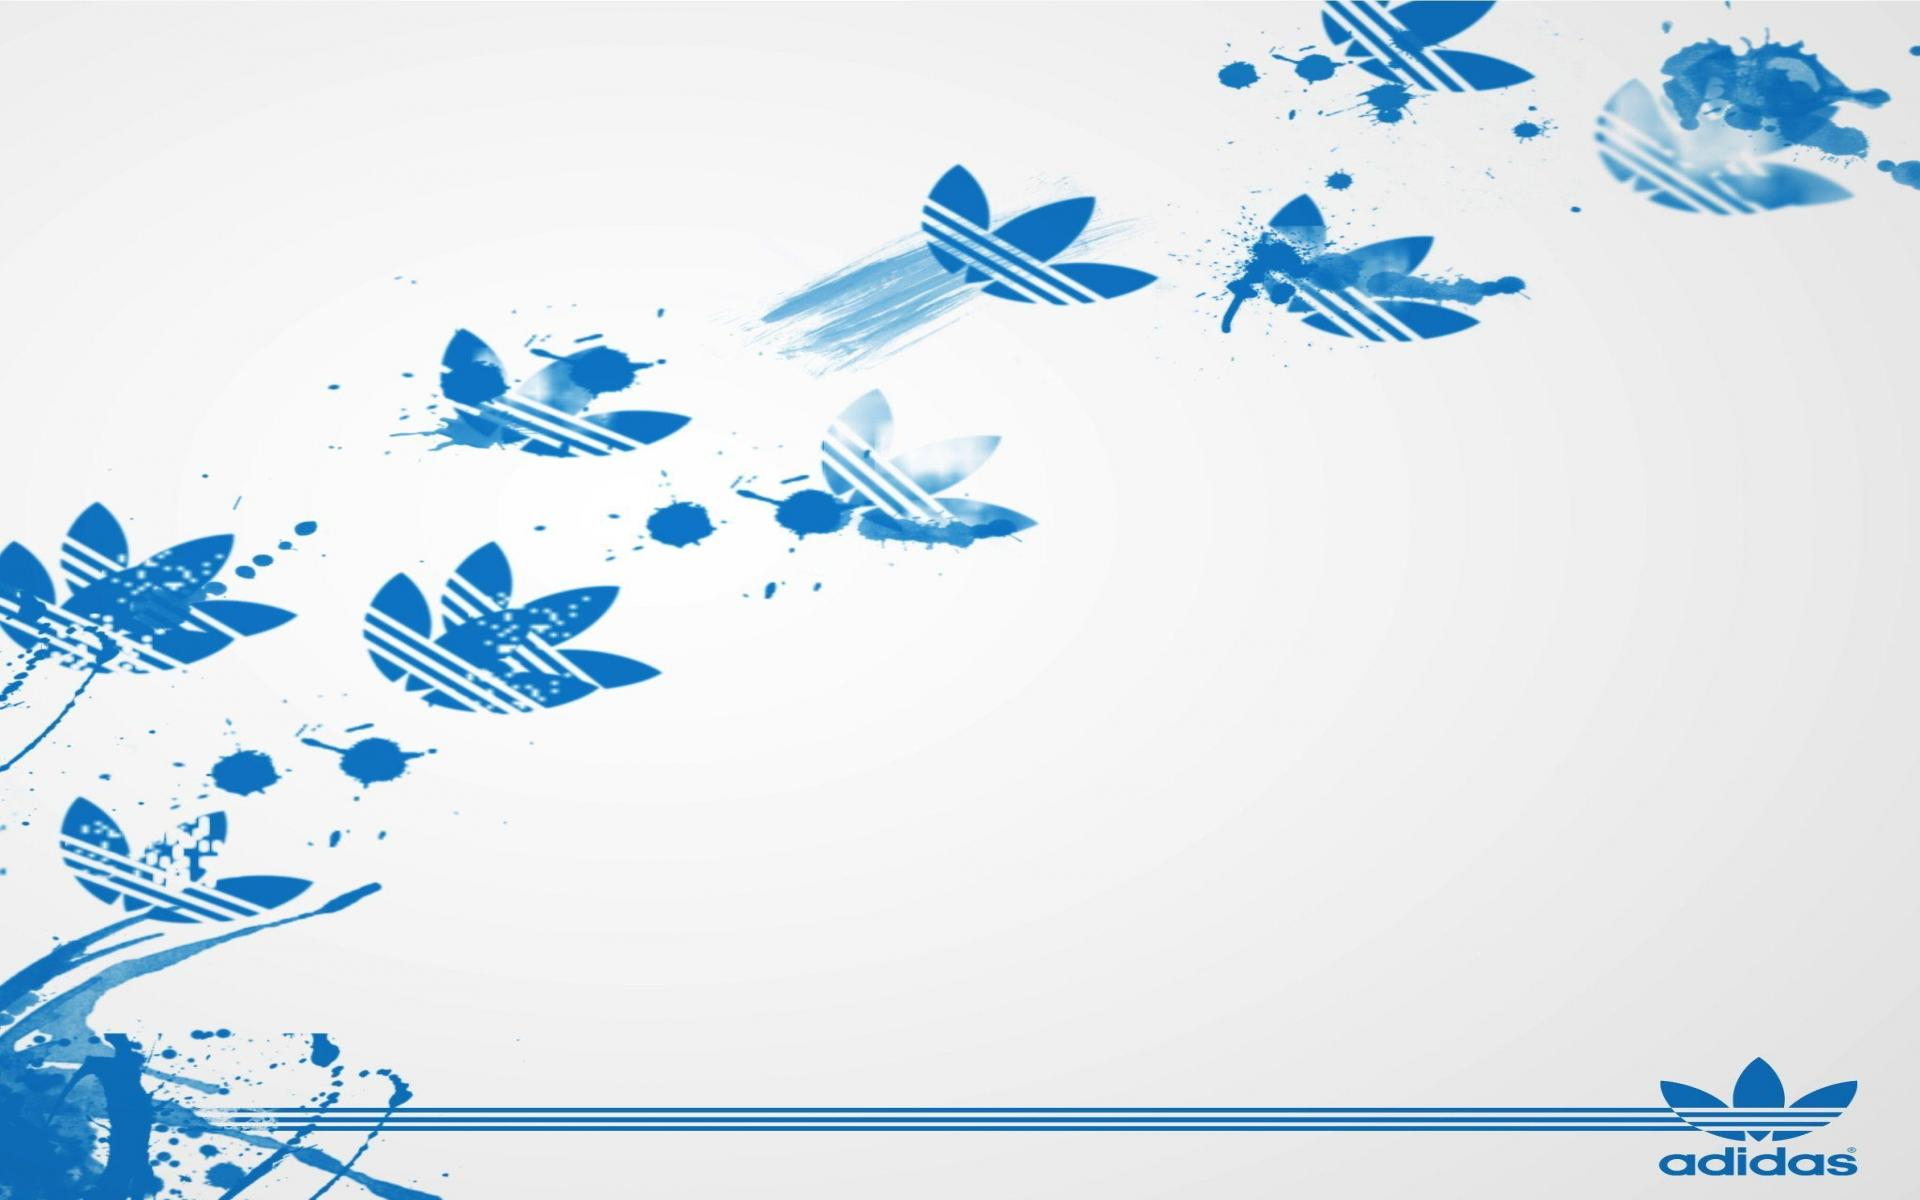 Adidas Originals Wallpaper Desktop Hd , HD Wallpaper & Backgrounds